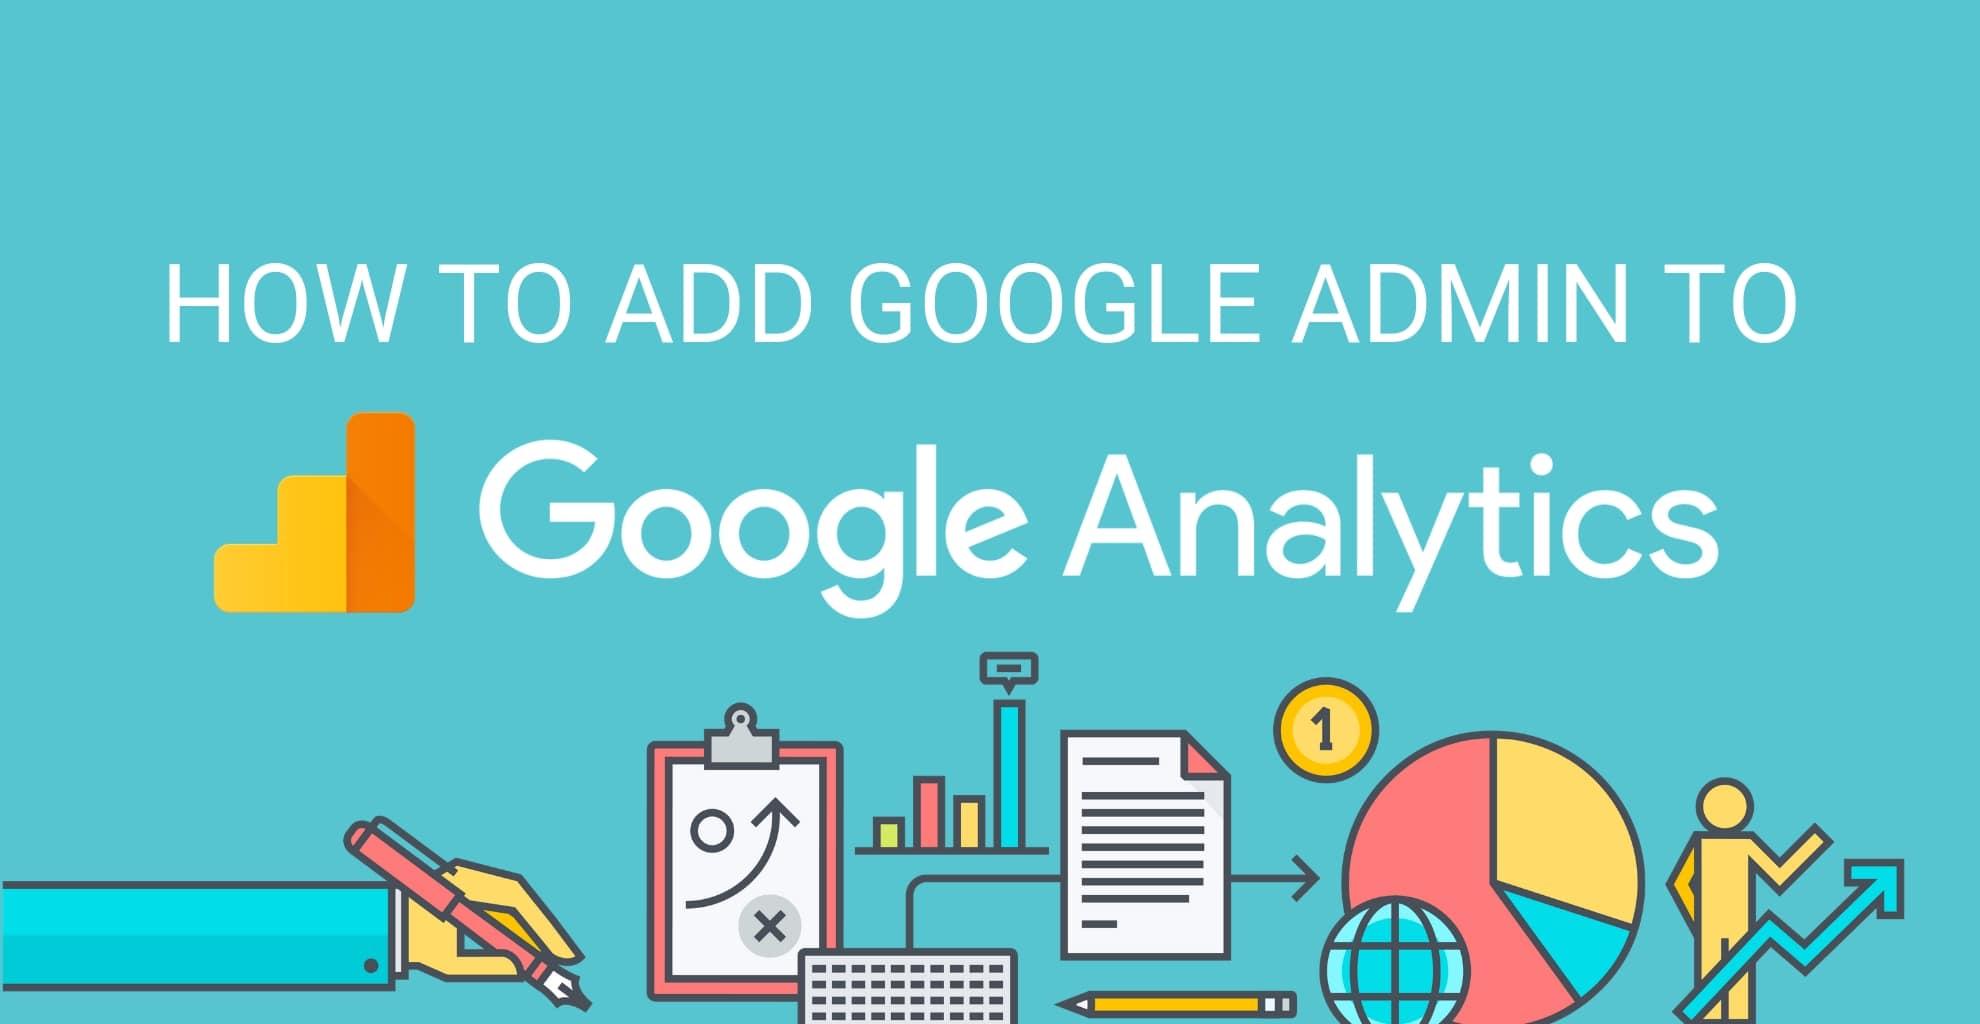 How to Add Google Admin to Google Analytics